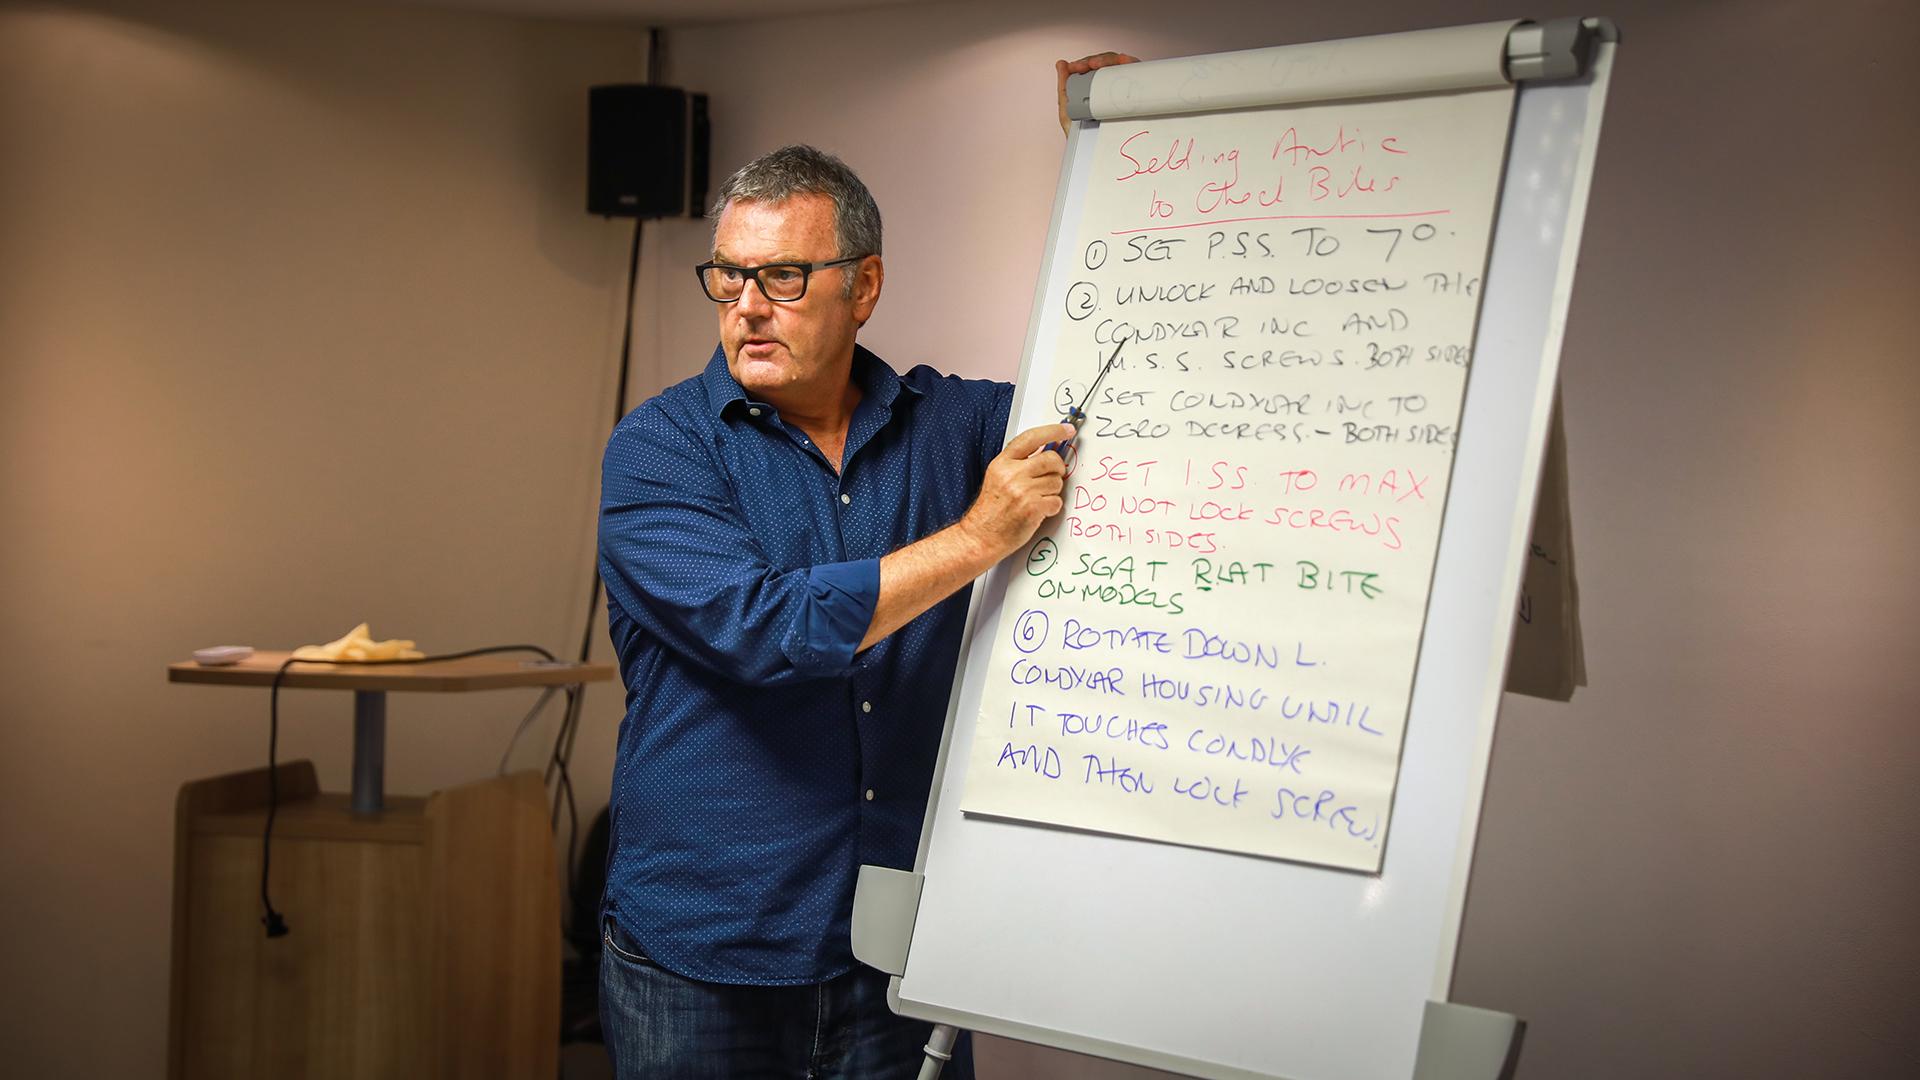 Professor Paul Tipton RCS Accreditation